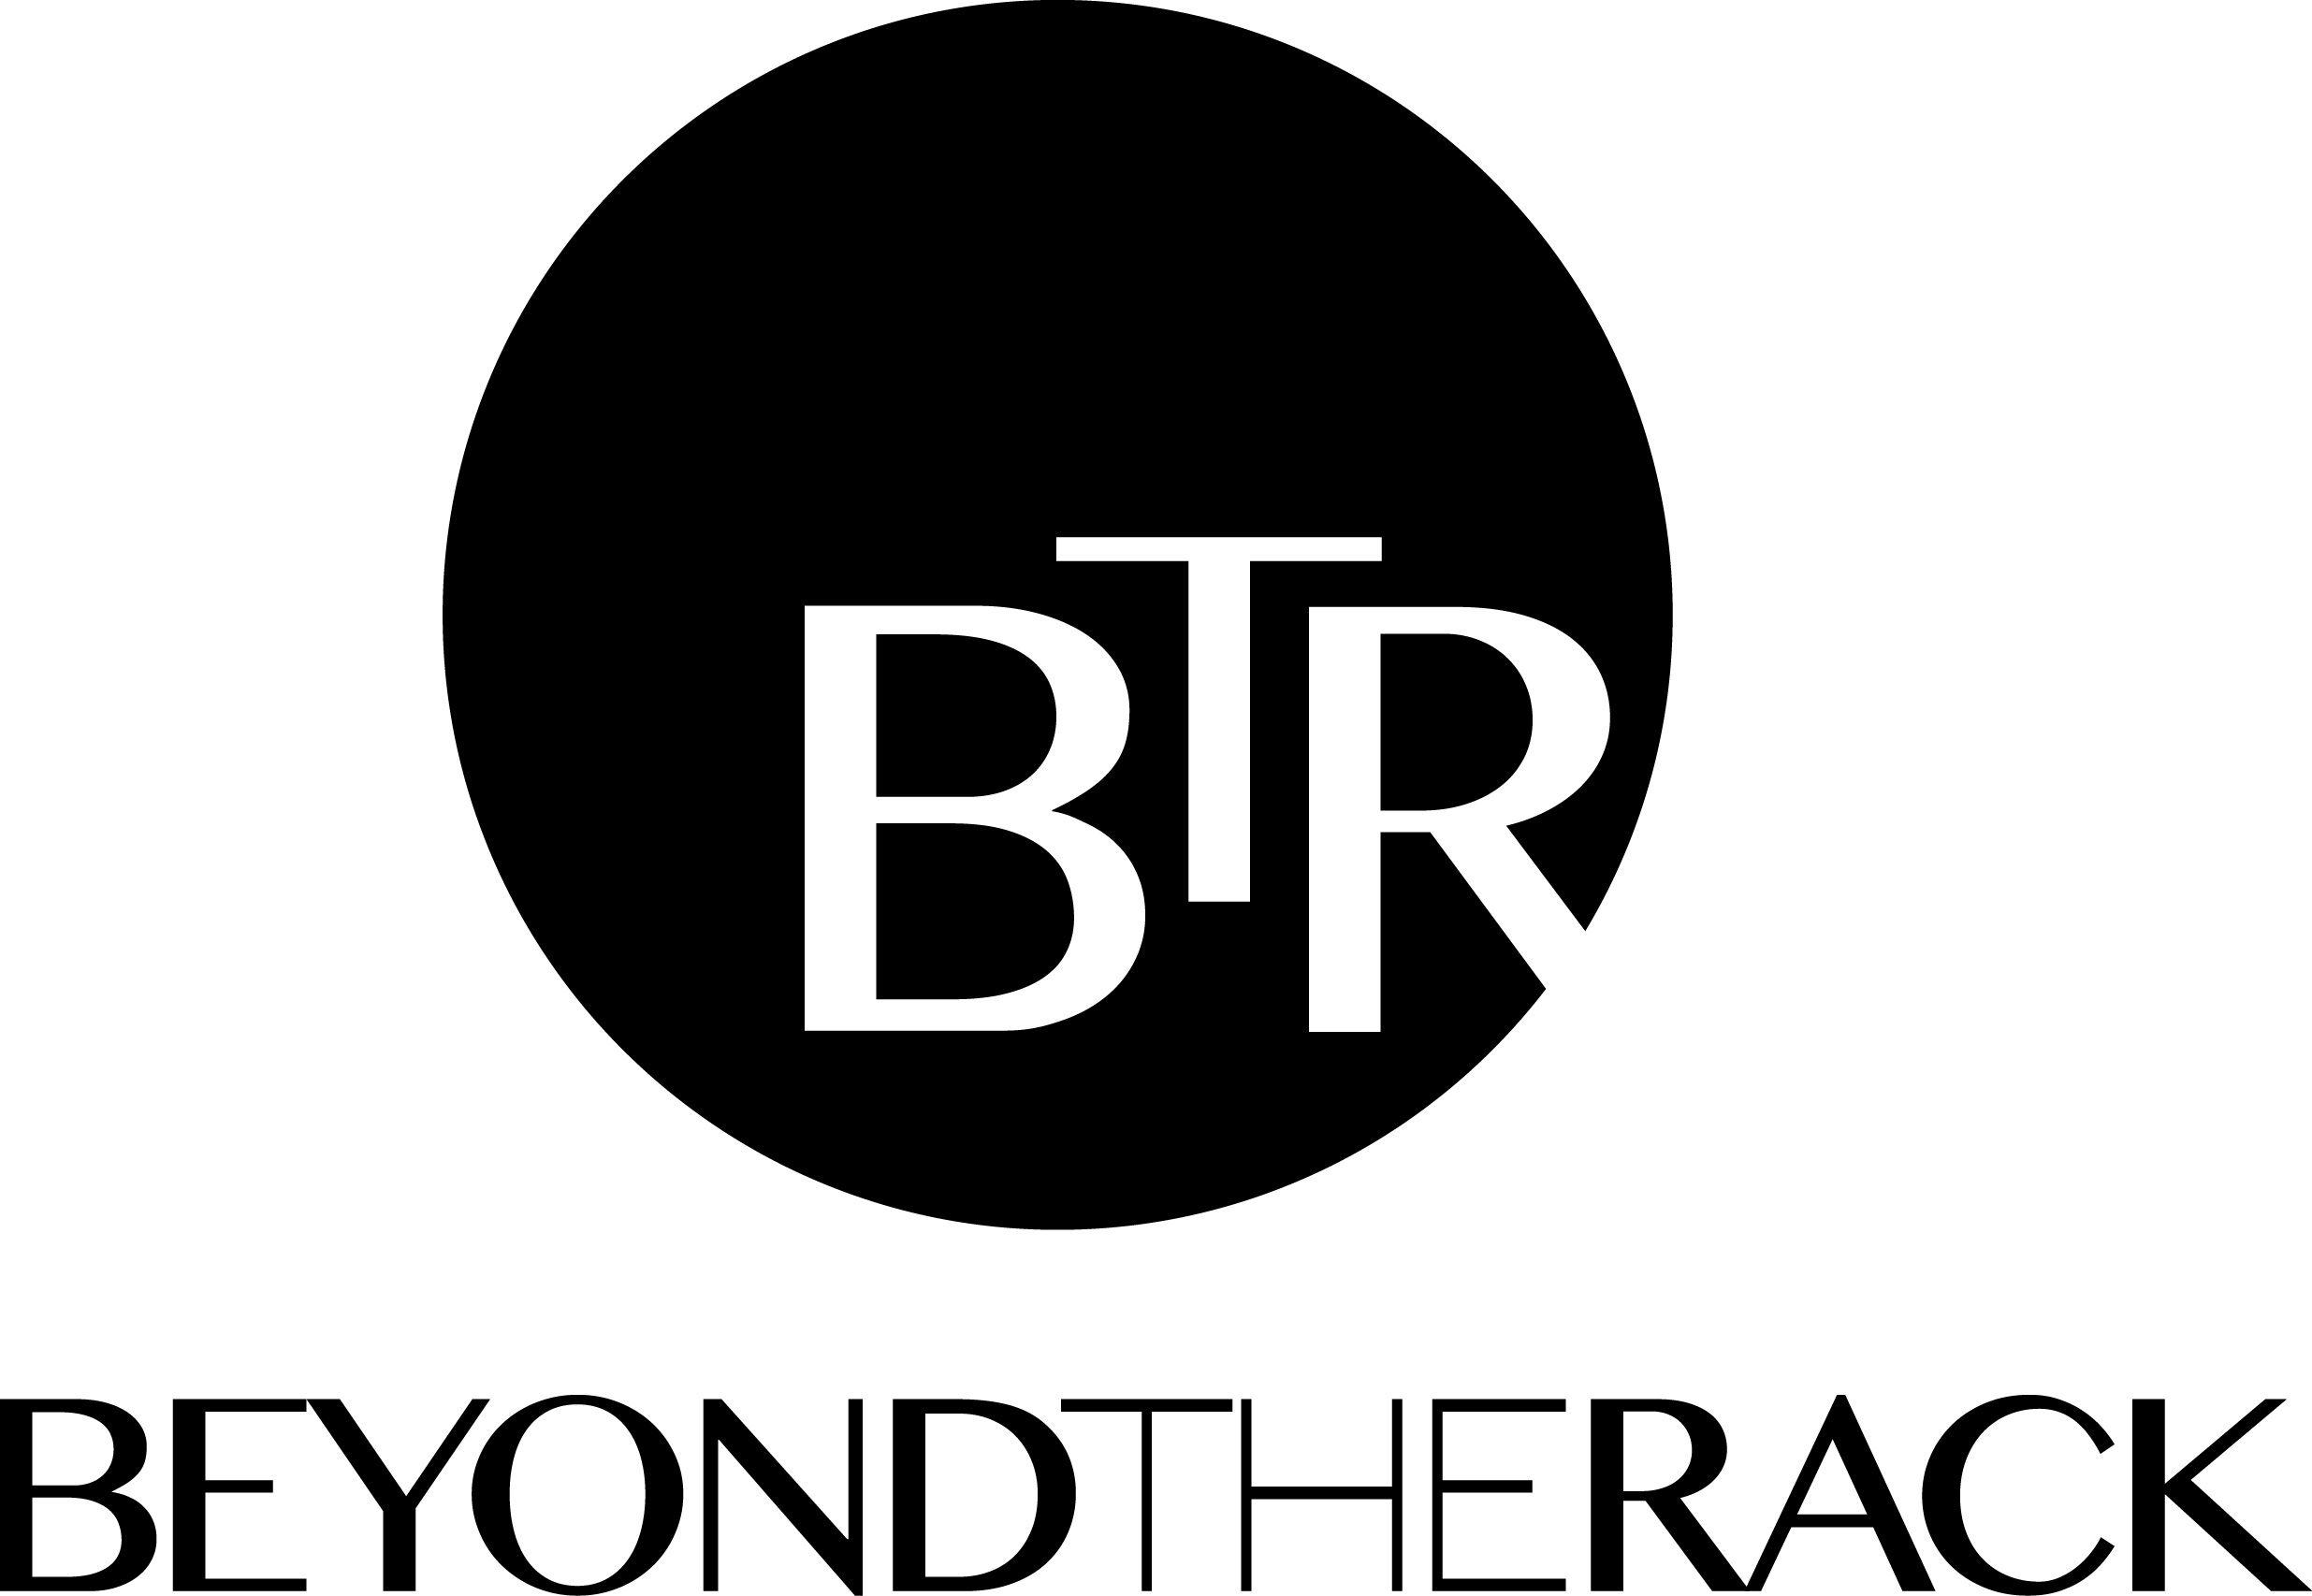 Btr logo beauty fashion pinterest borders free spring btr logo fandeluxe Gallery